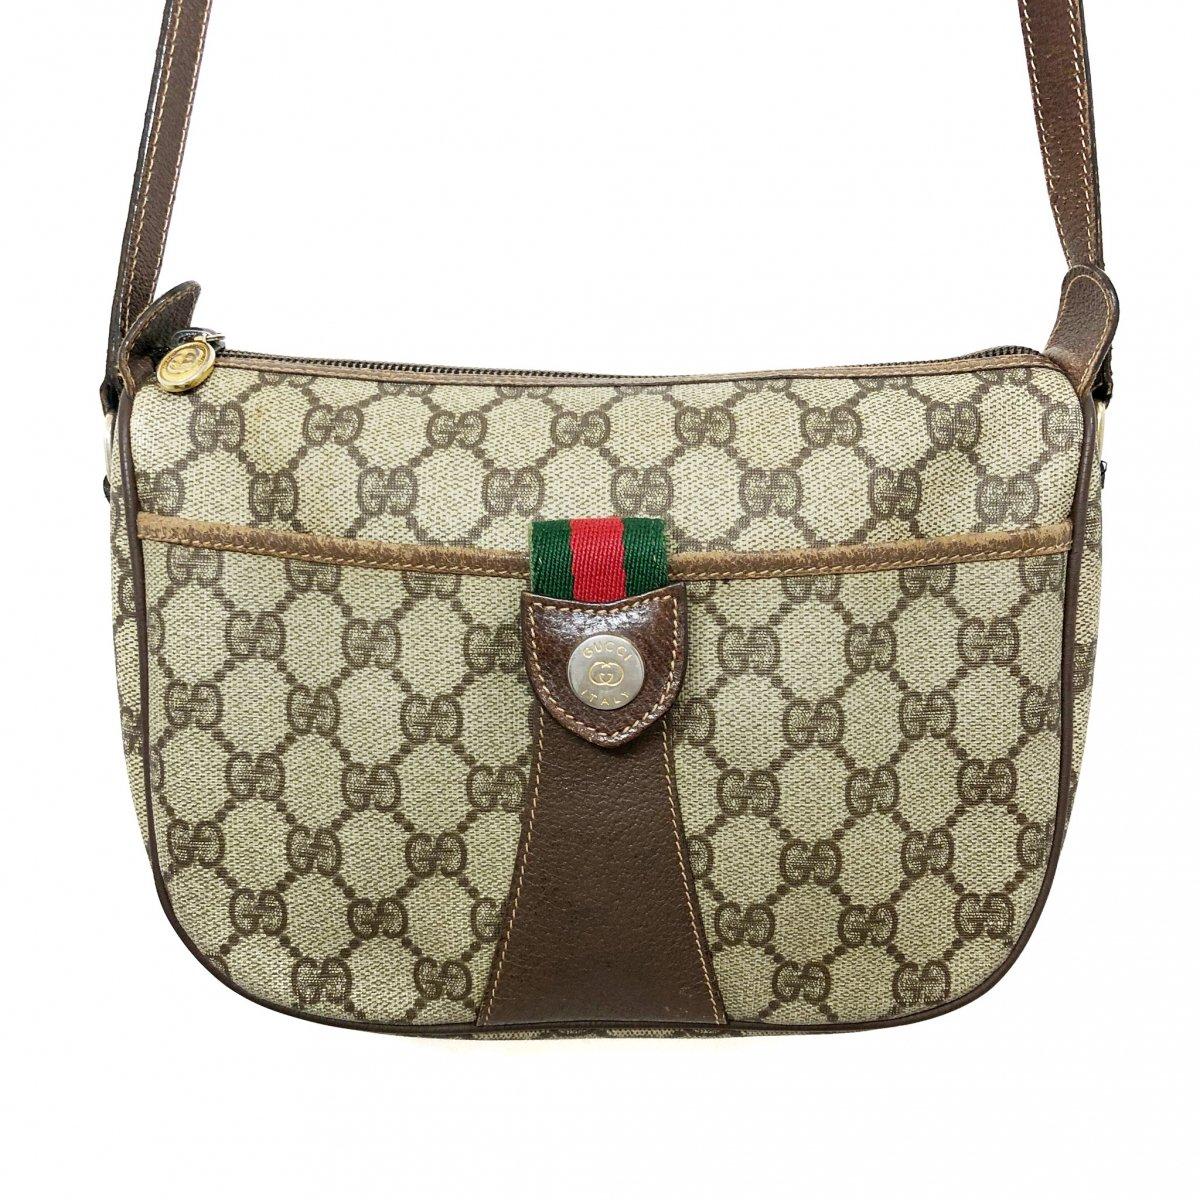 new concept ce395 7c1a2 イタリア製 80s OLD GUCCI Sherry Line GG Pattern Shoulder Bag オールドグッチ シェリーライン GG柄  ショルダーバッグ アクセサリーコレクション - NEWJOKE ONLINE STORE